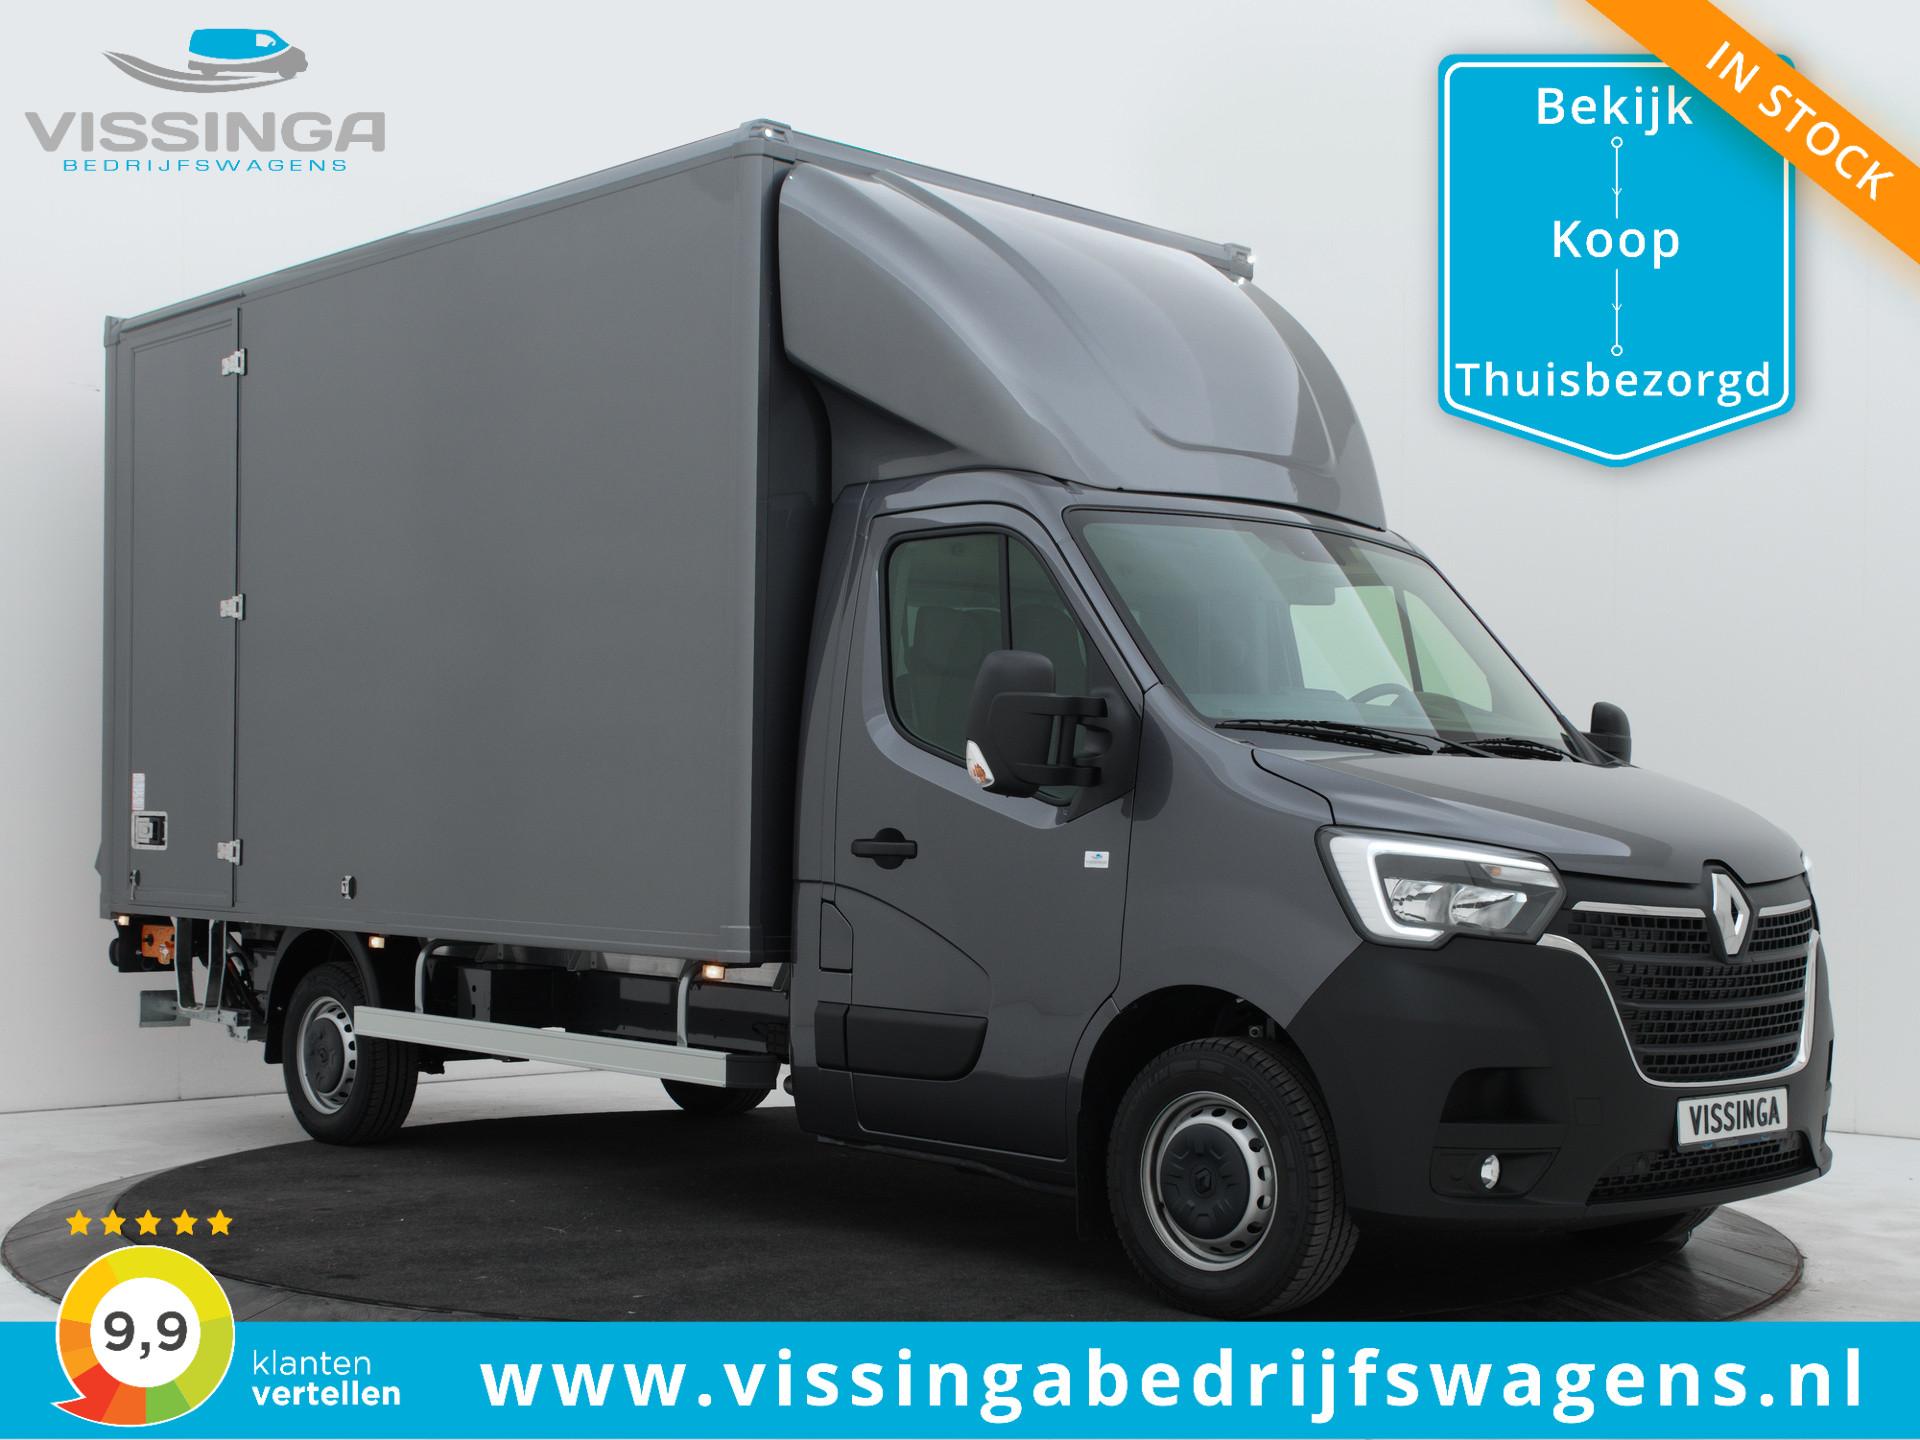 Renault Master FWD 145 pk Bakwagen 420x211x232 (20.5 m3)